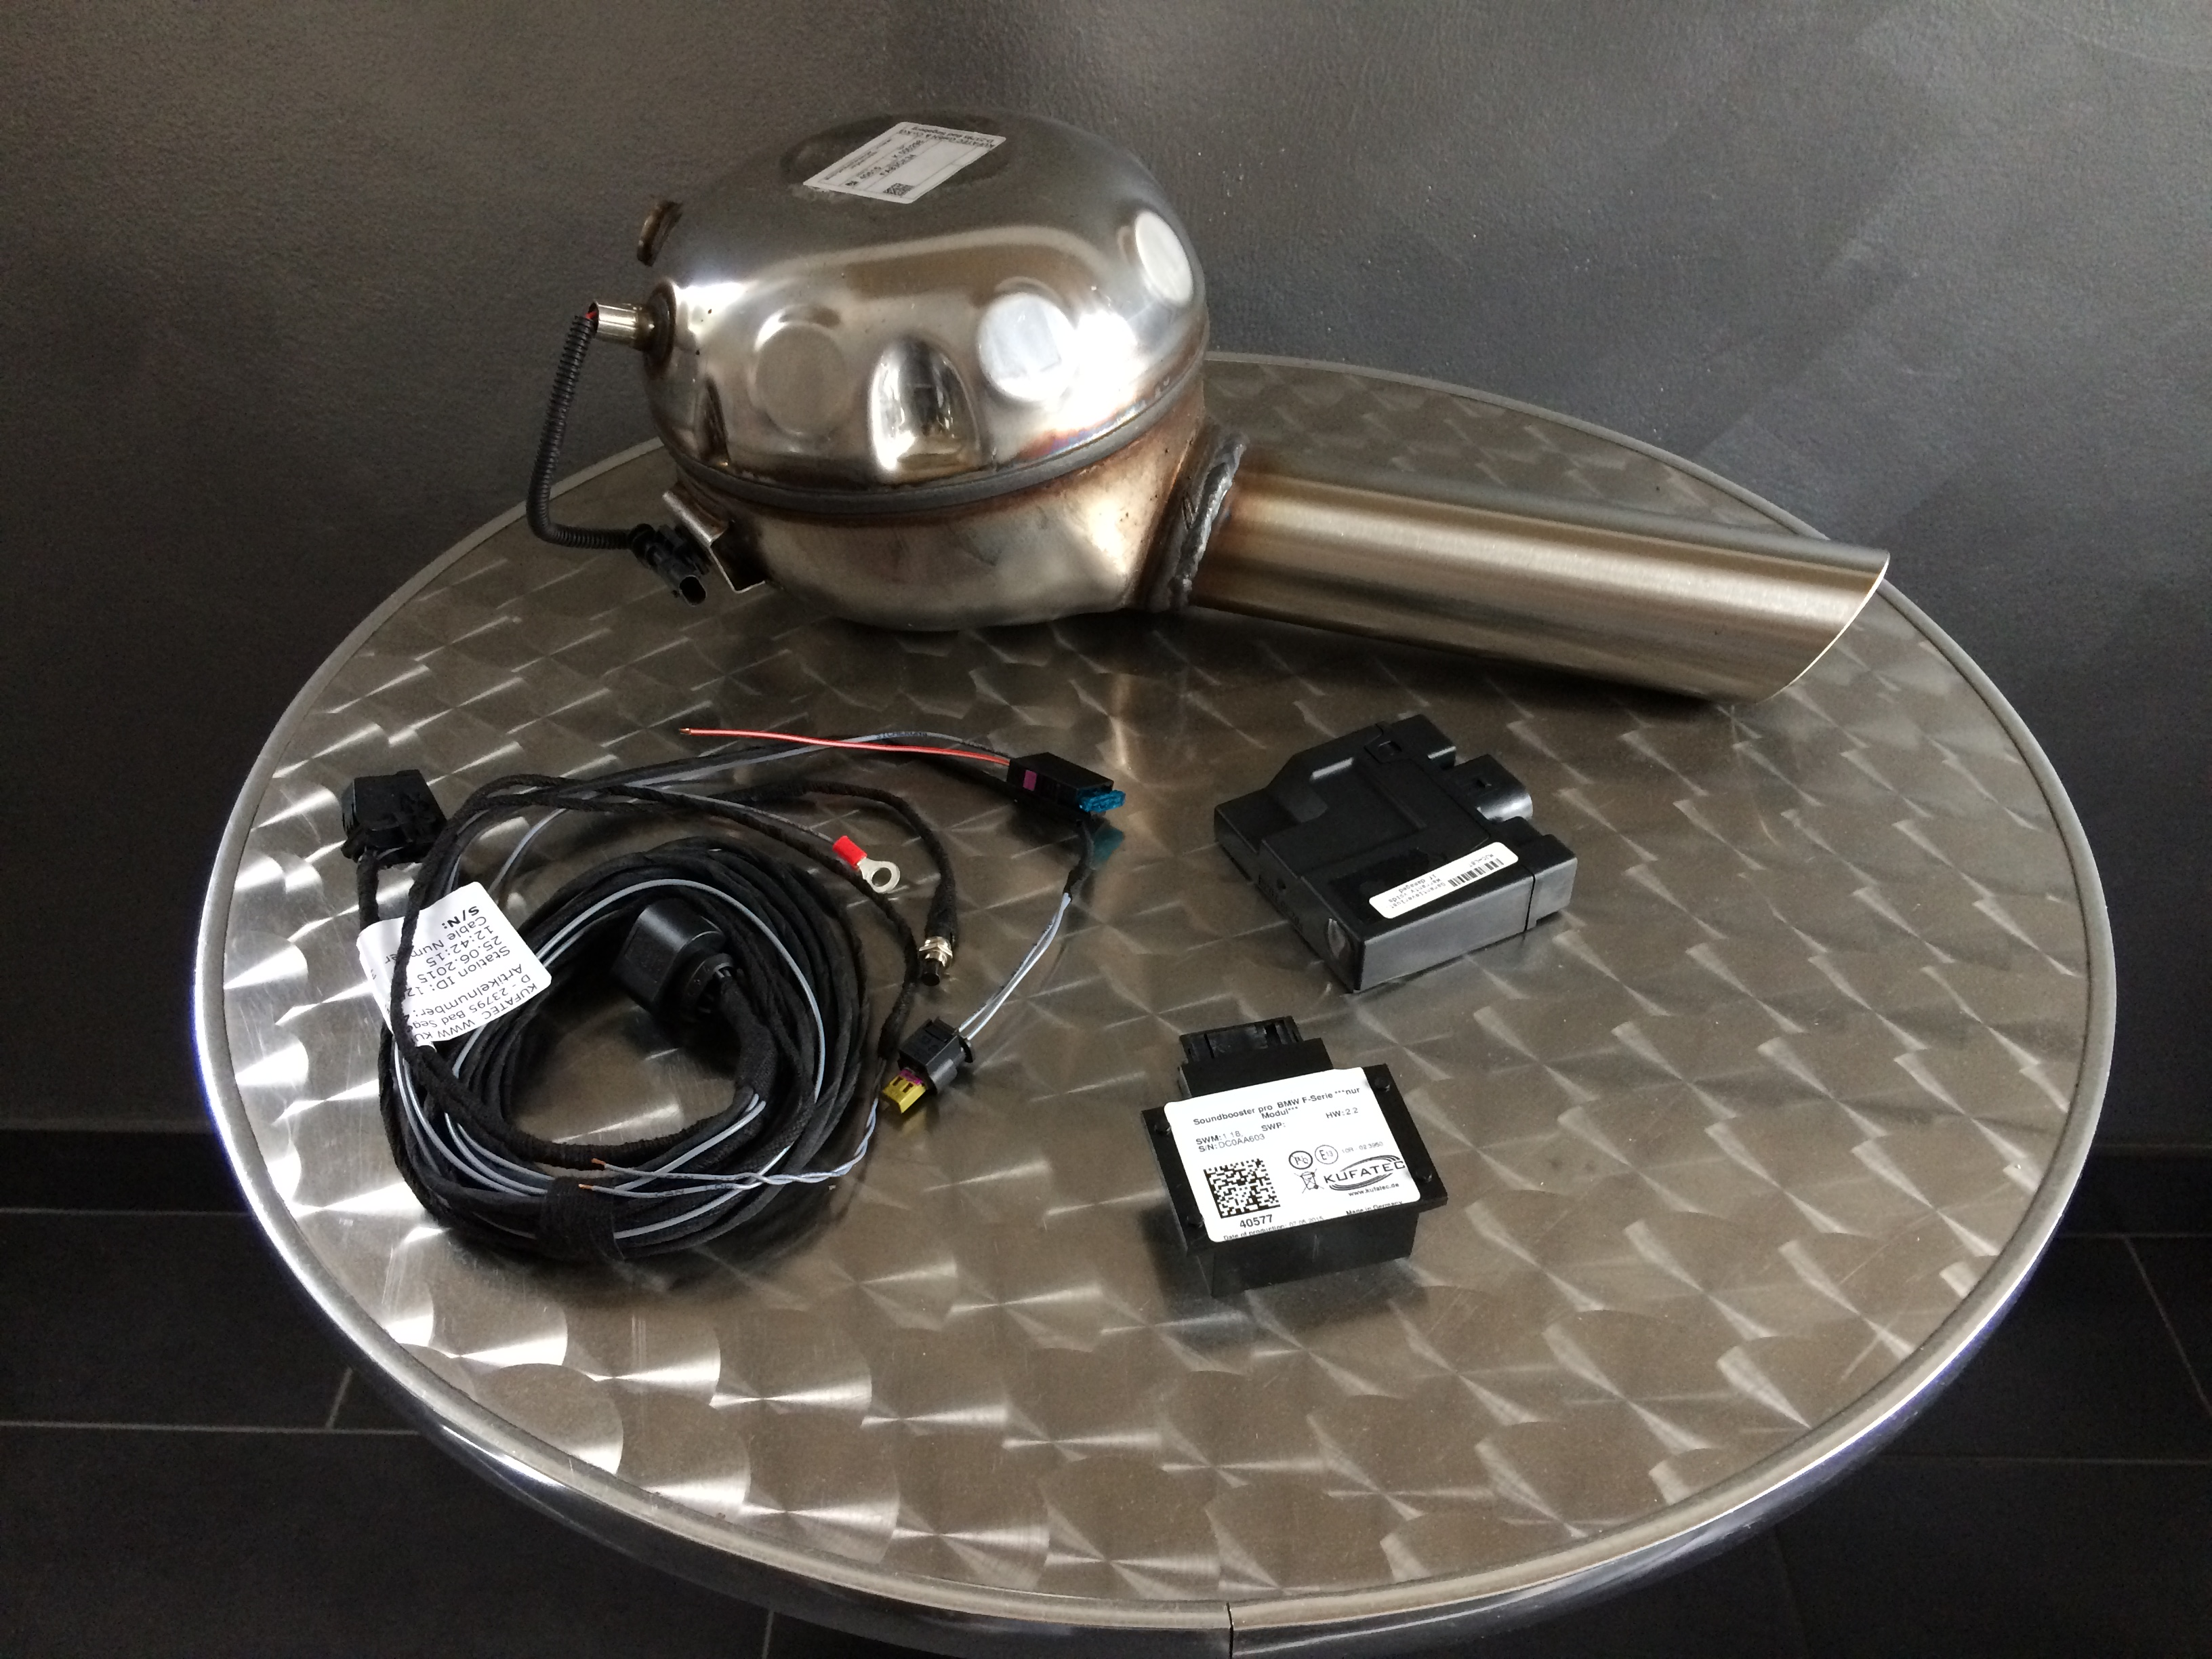 Sound Booster Pro - Motor Active Sound - Tesla - inkl. 16% Mehrwertsteuer + Versand